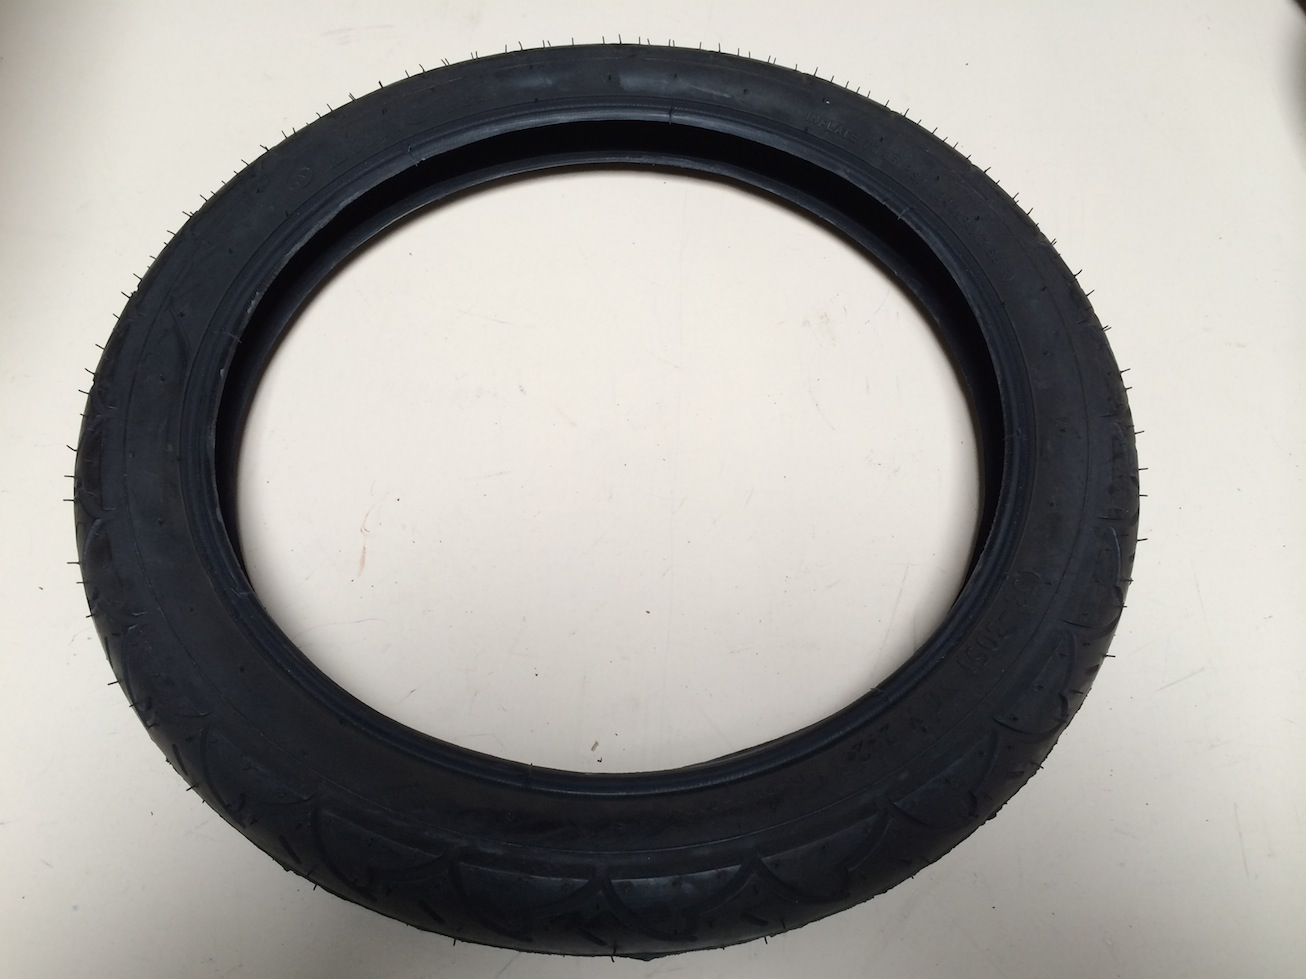 yedoo pneu 16 pouces yedoo trotineo. Black Bedroom Furniture Sets. Home Design Ideas